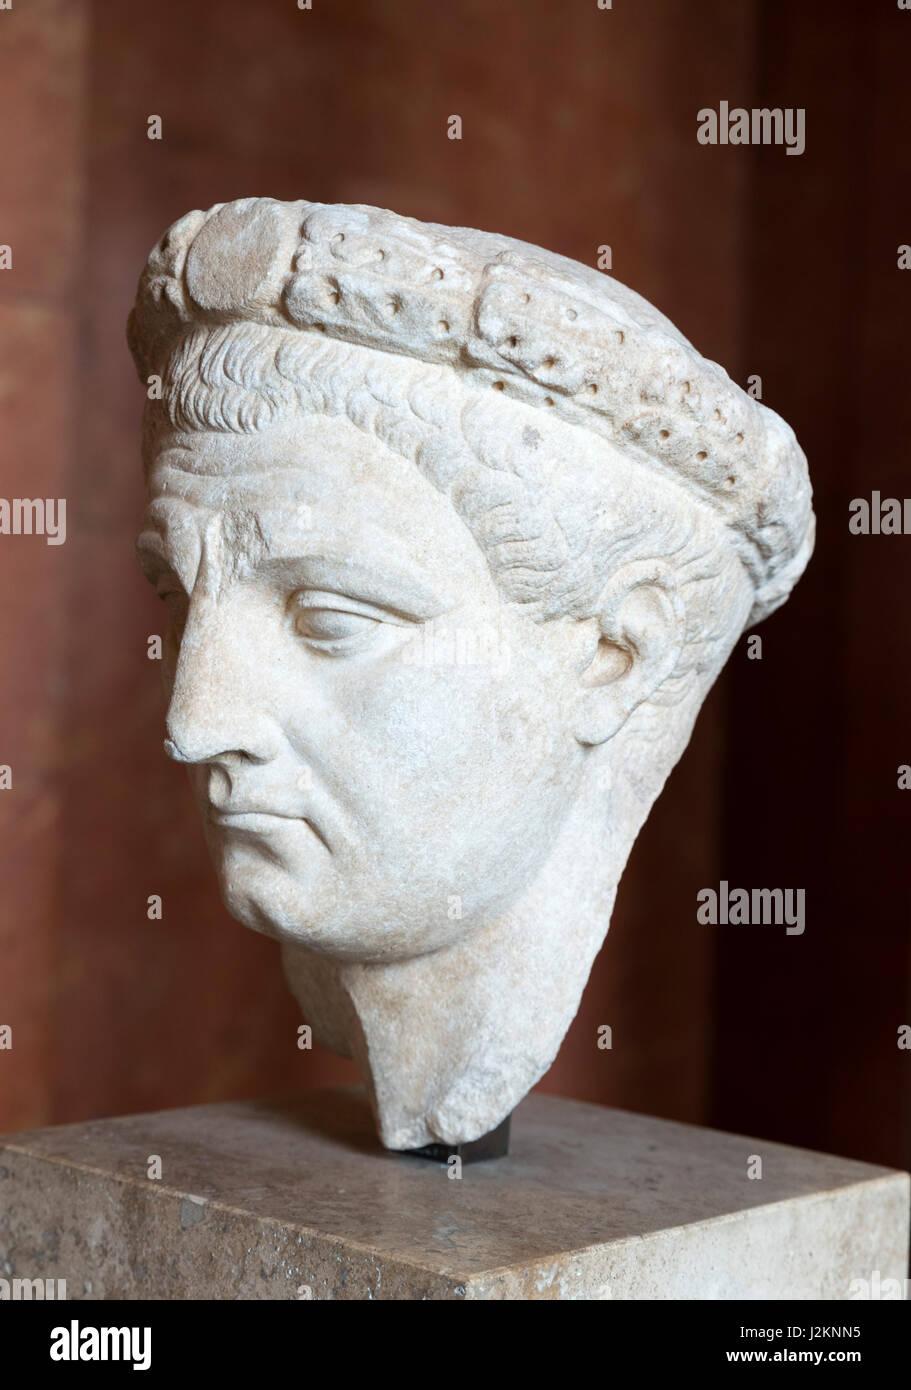 Claudius. Marble bust of the Emperor Claudius (10 BC – 54 AD), fourth Emperor of the Roman Empire, date c. AD 50 - Stock Image